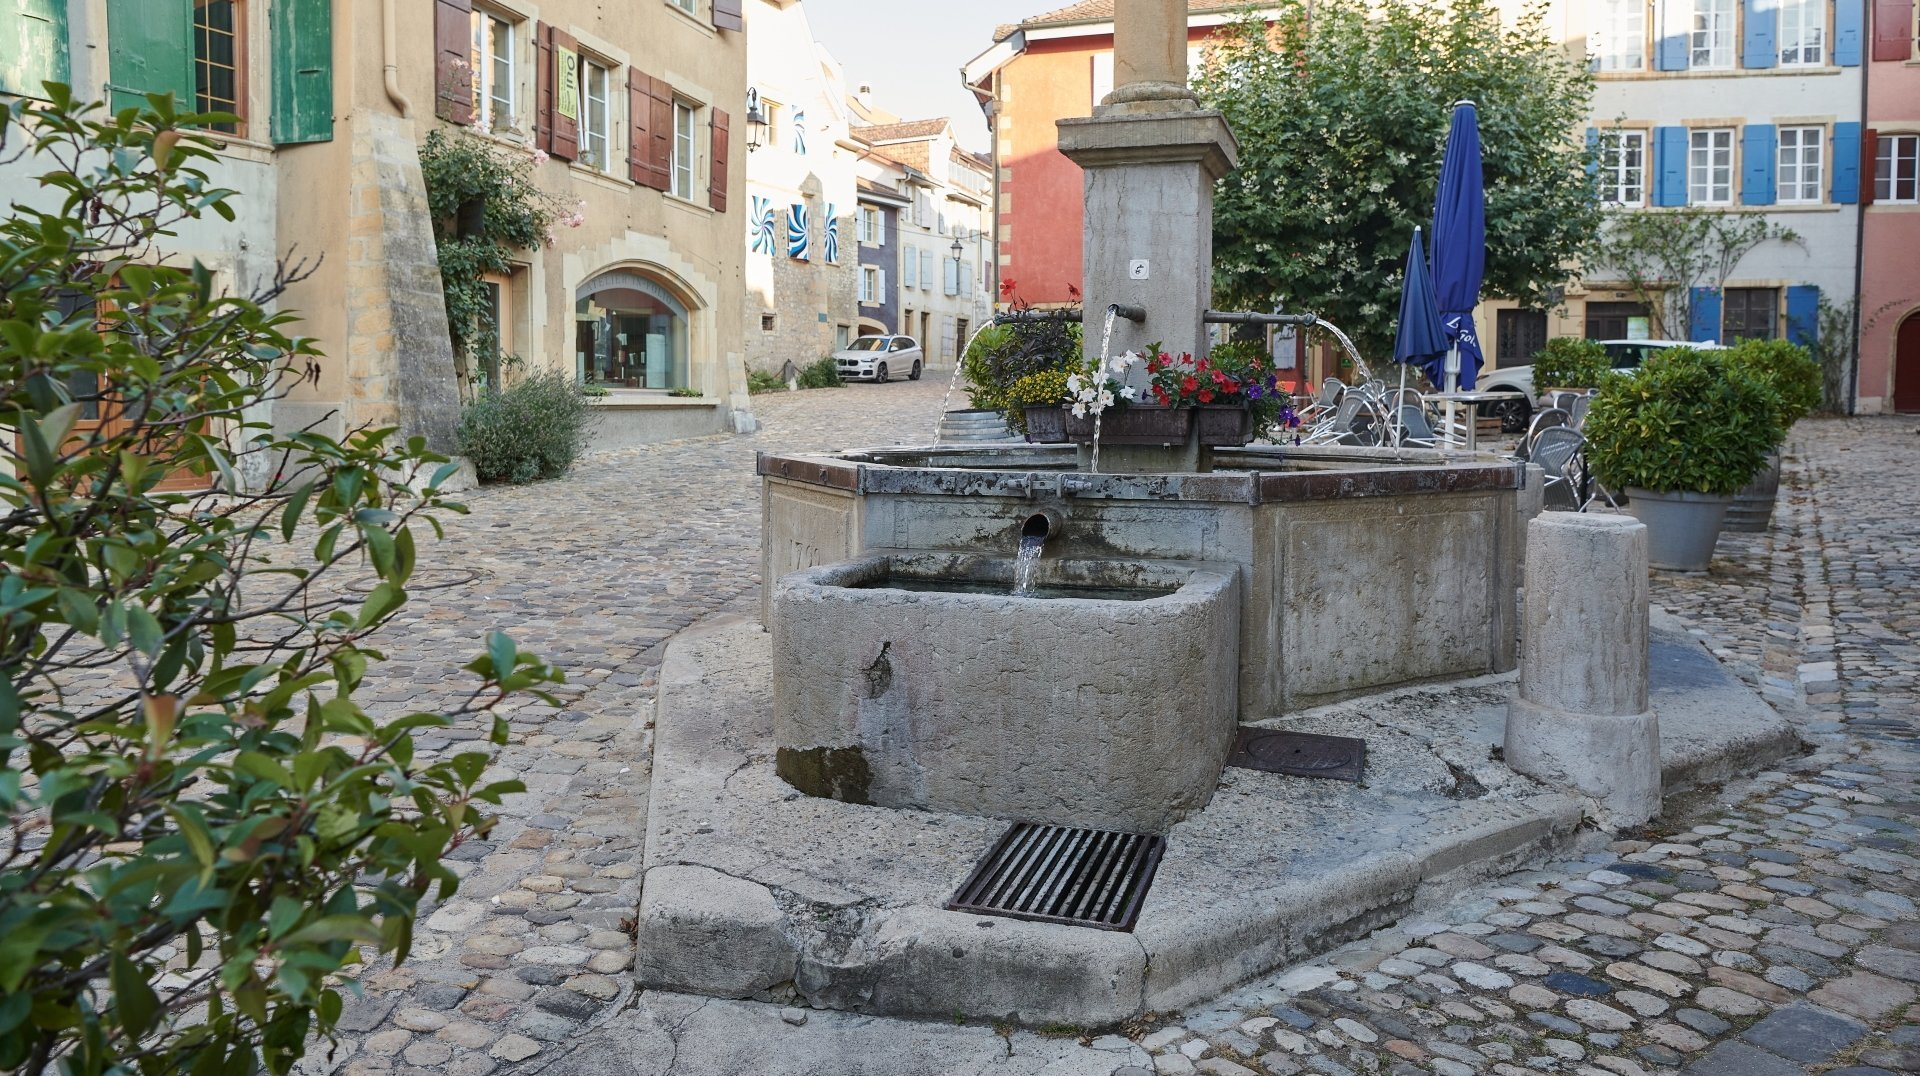 La Commune de Milvignes va restaurer ses fontaines